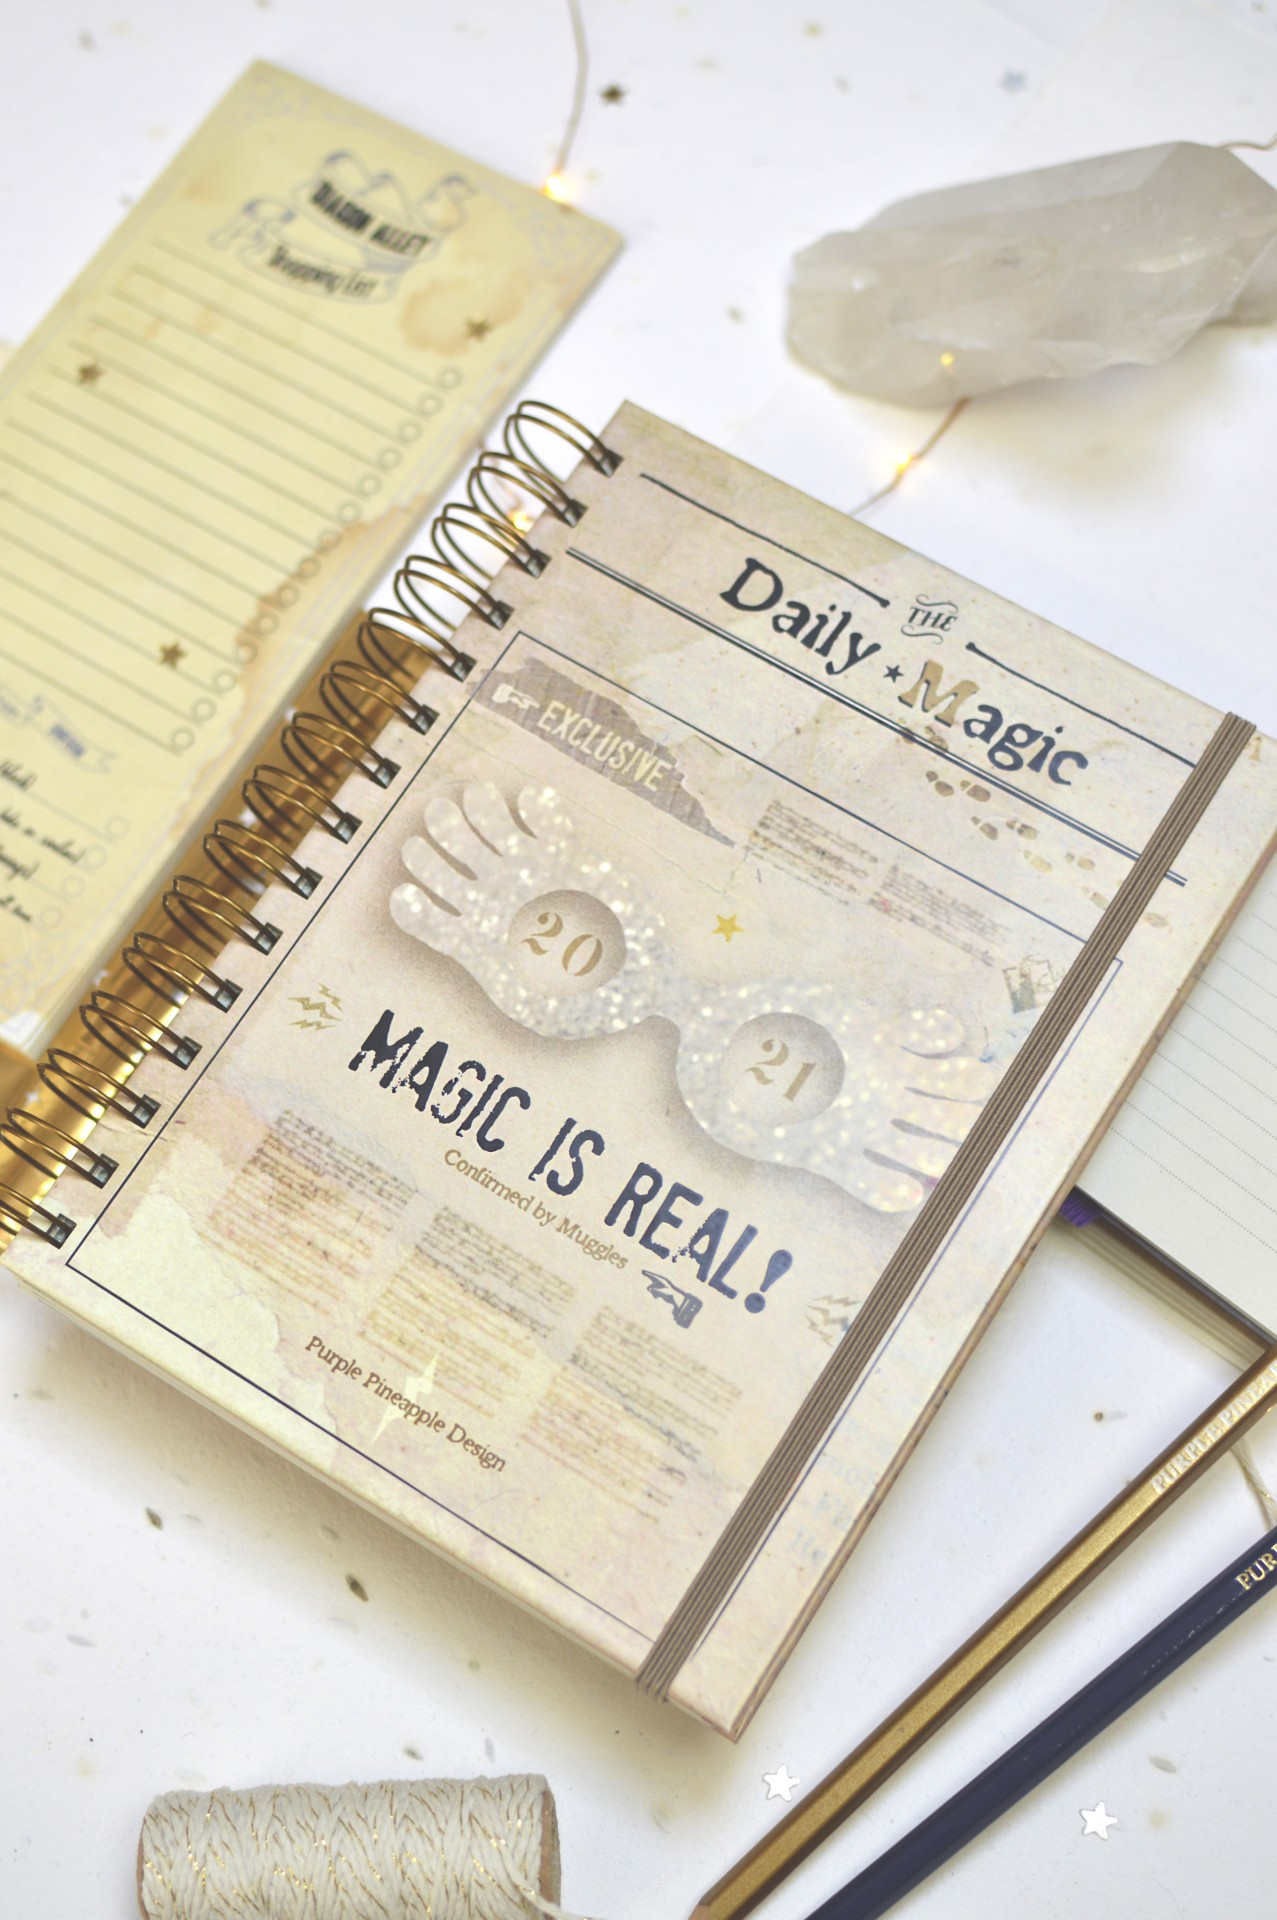 Agenda Daily Magic ★ 2020 / 2021